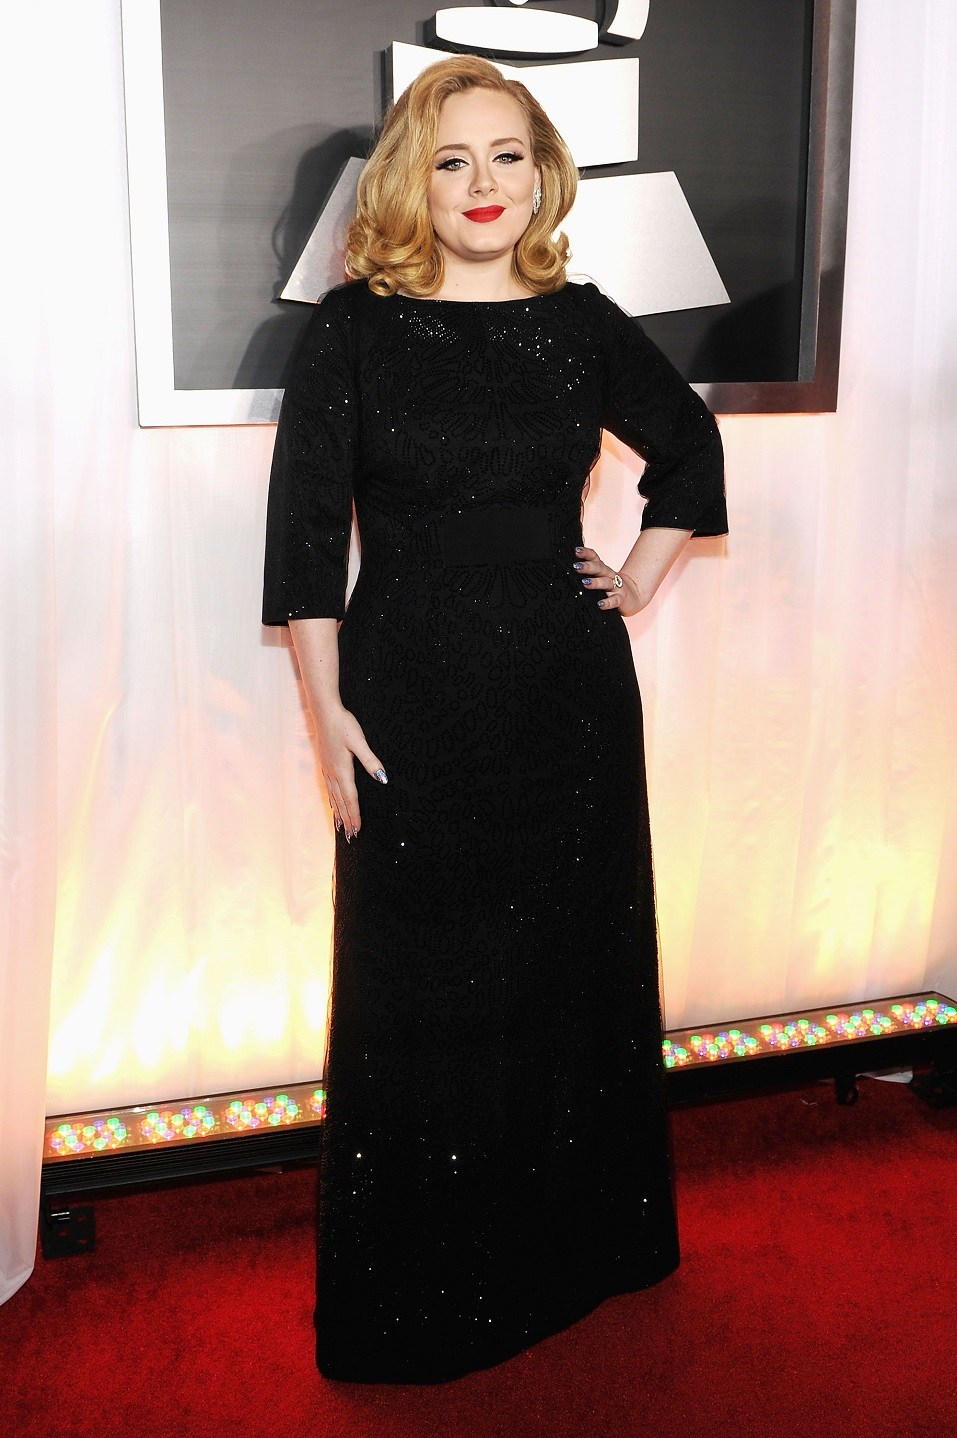 Singer Adele arrives at the 54th Annual GRAMMY Awards held at Staples Center